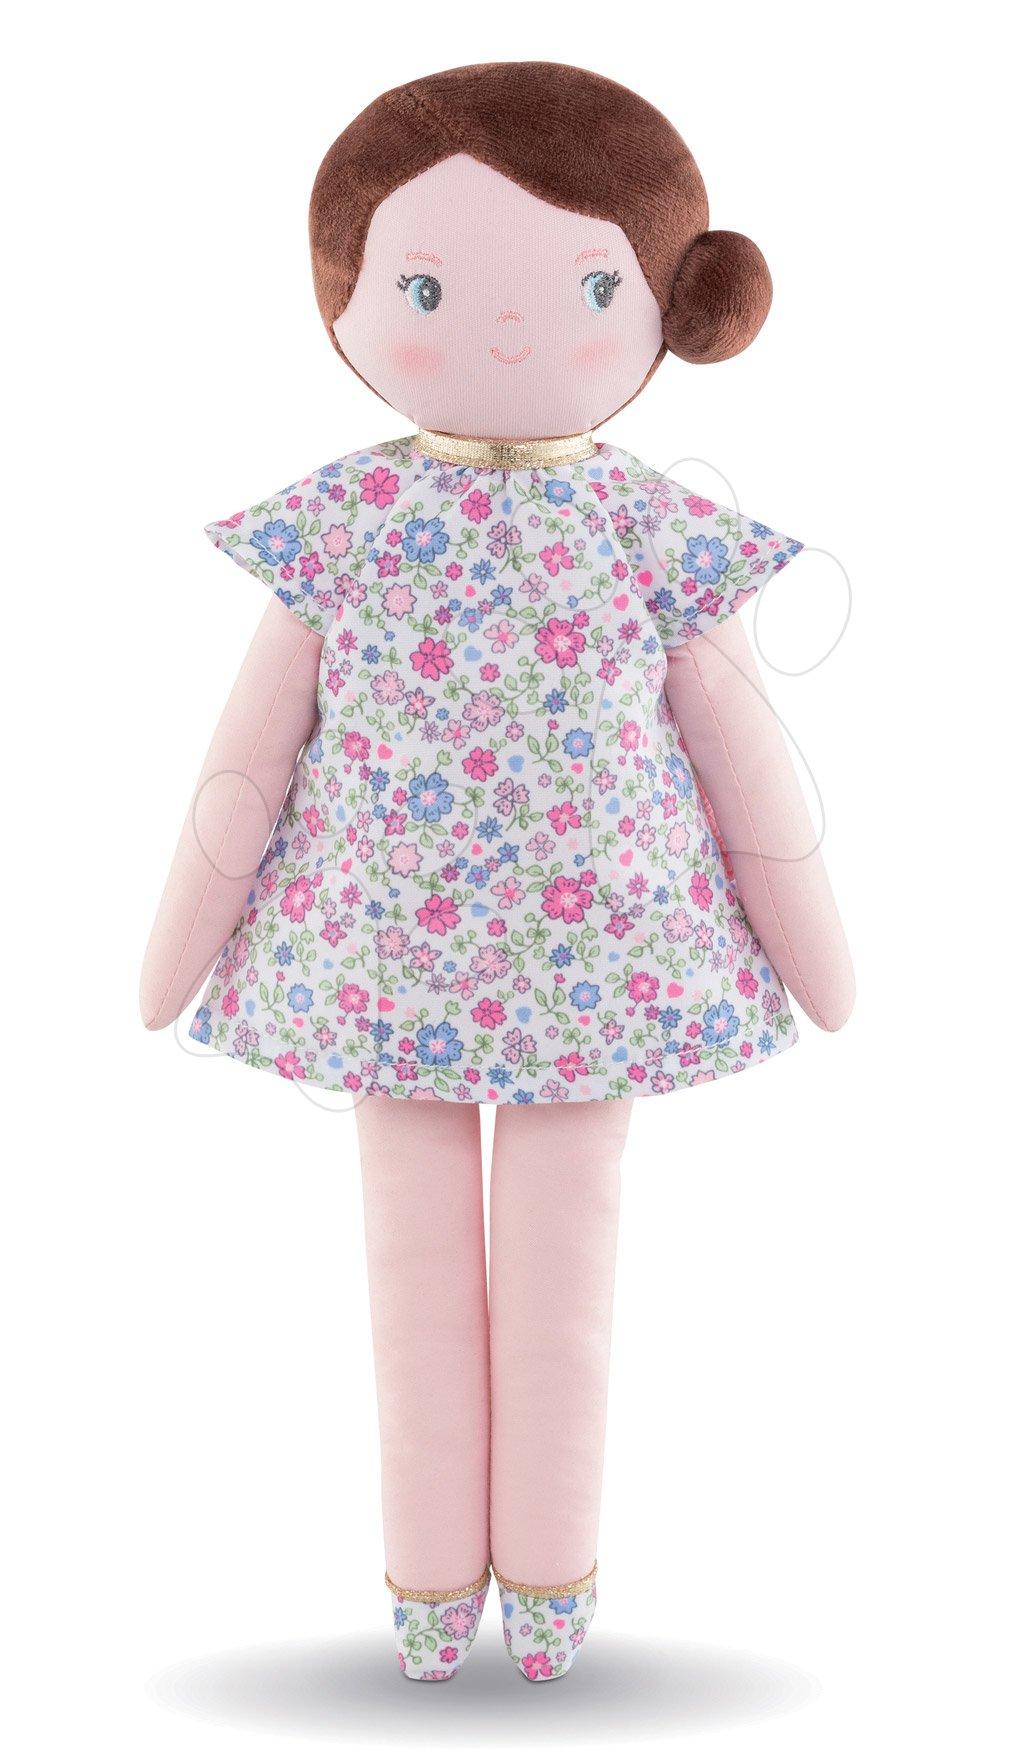 Handrová bábika Bella Corolle's Flowers Corolle Mon Doudou s hnedými vláskami a modrými očami 34 cm od 0 mes